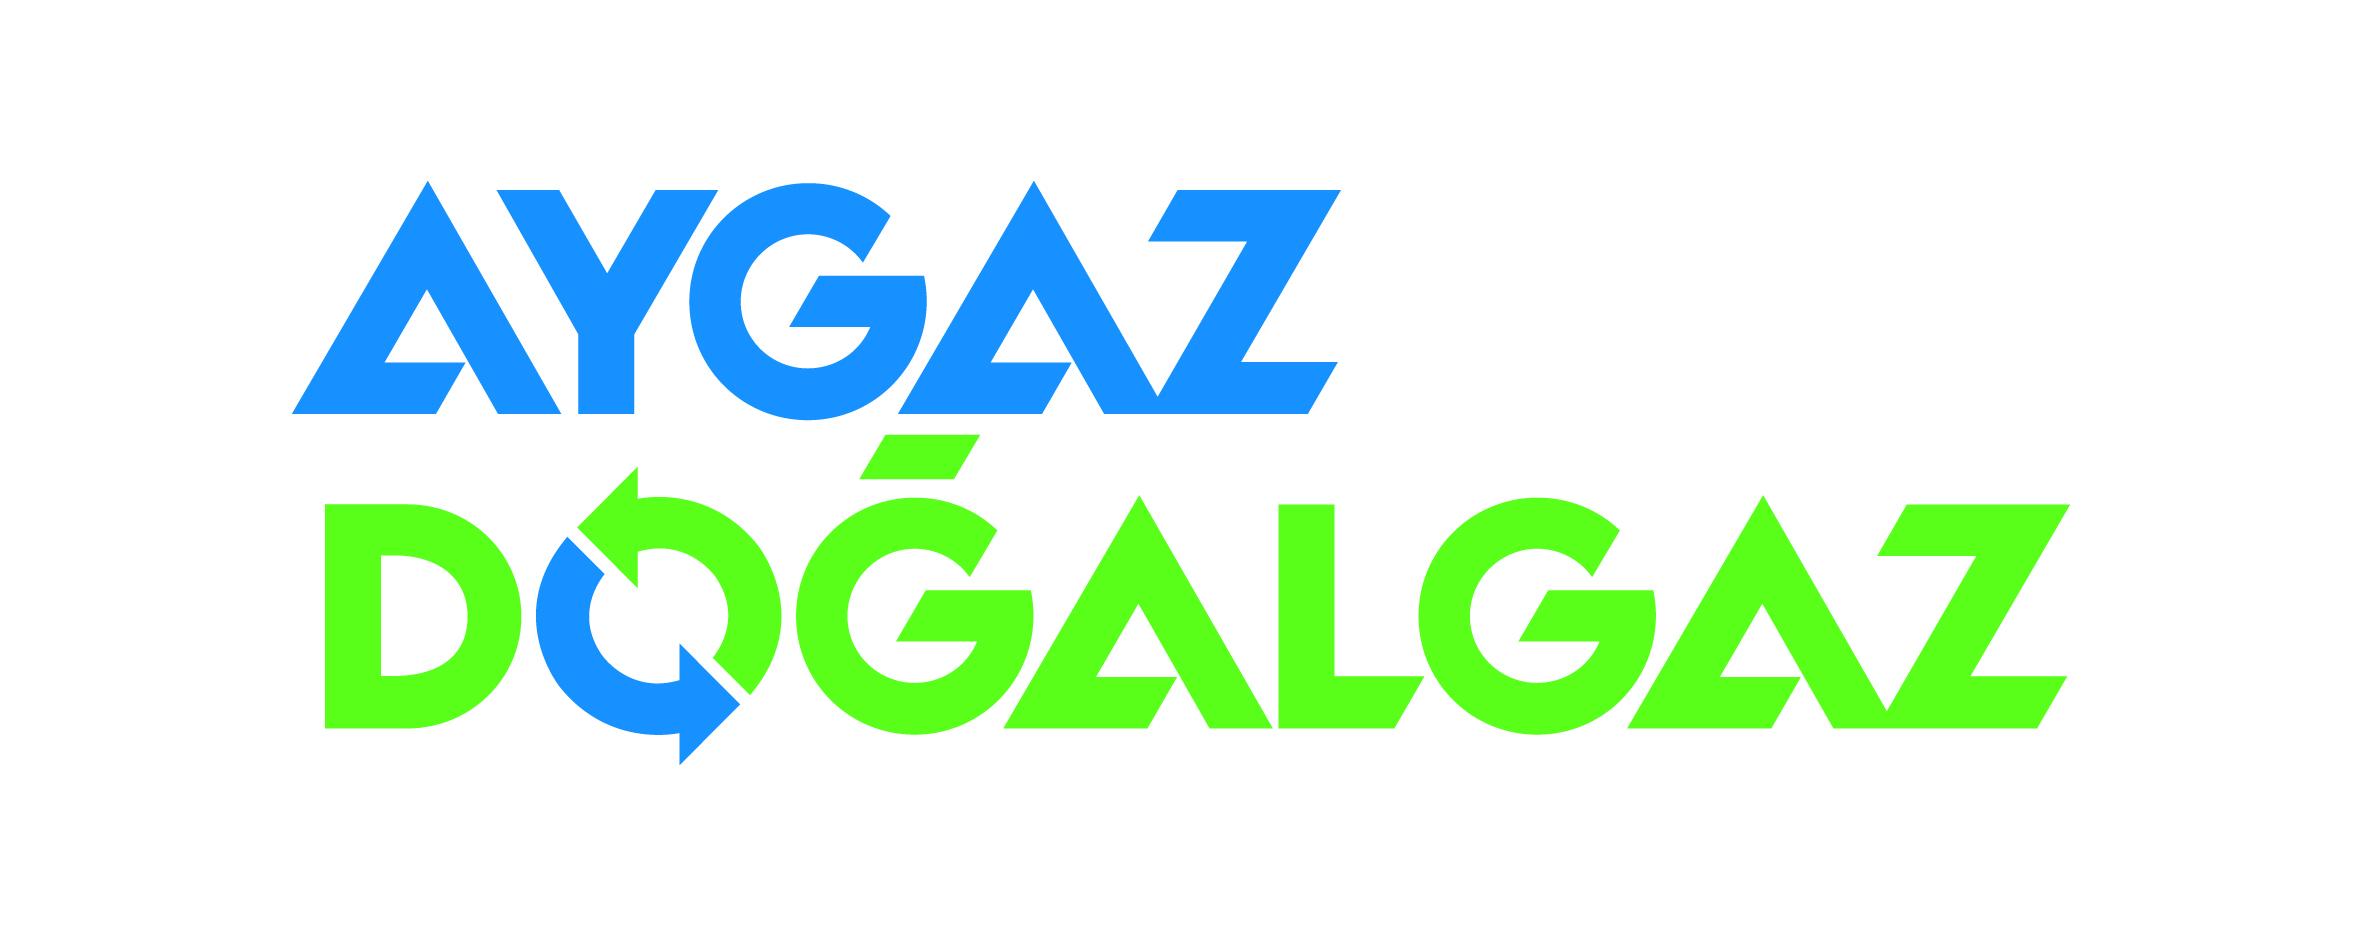 Aygaz Doğal Gaz - Aygaz Vector PNG